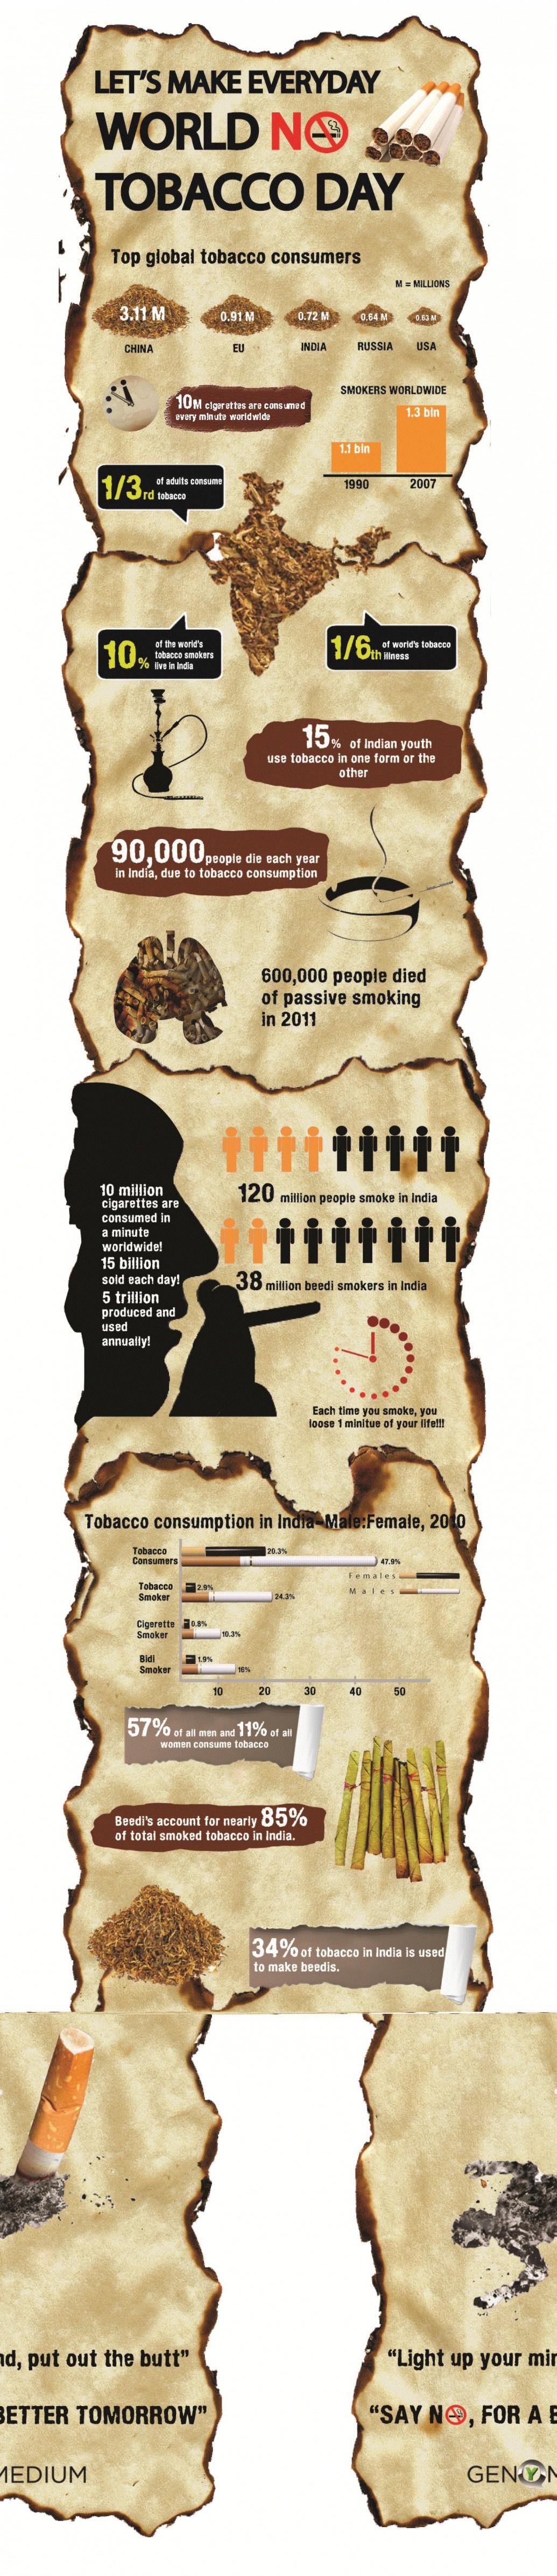 10. Top Tobacco Consumers